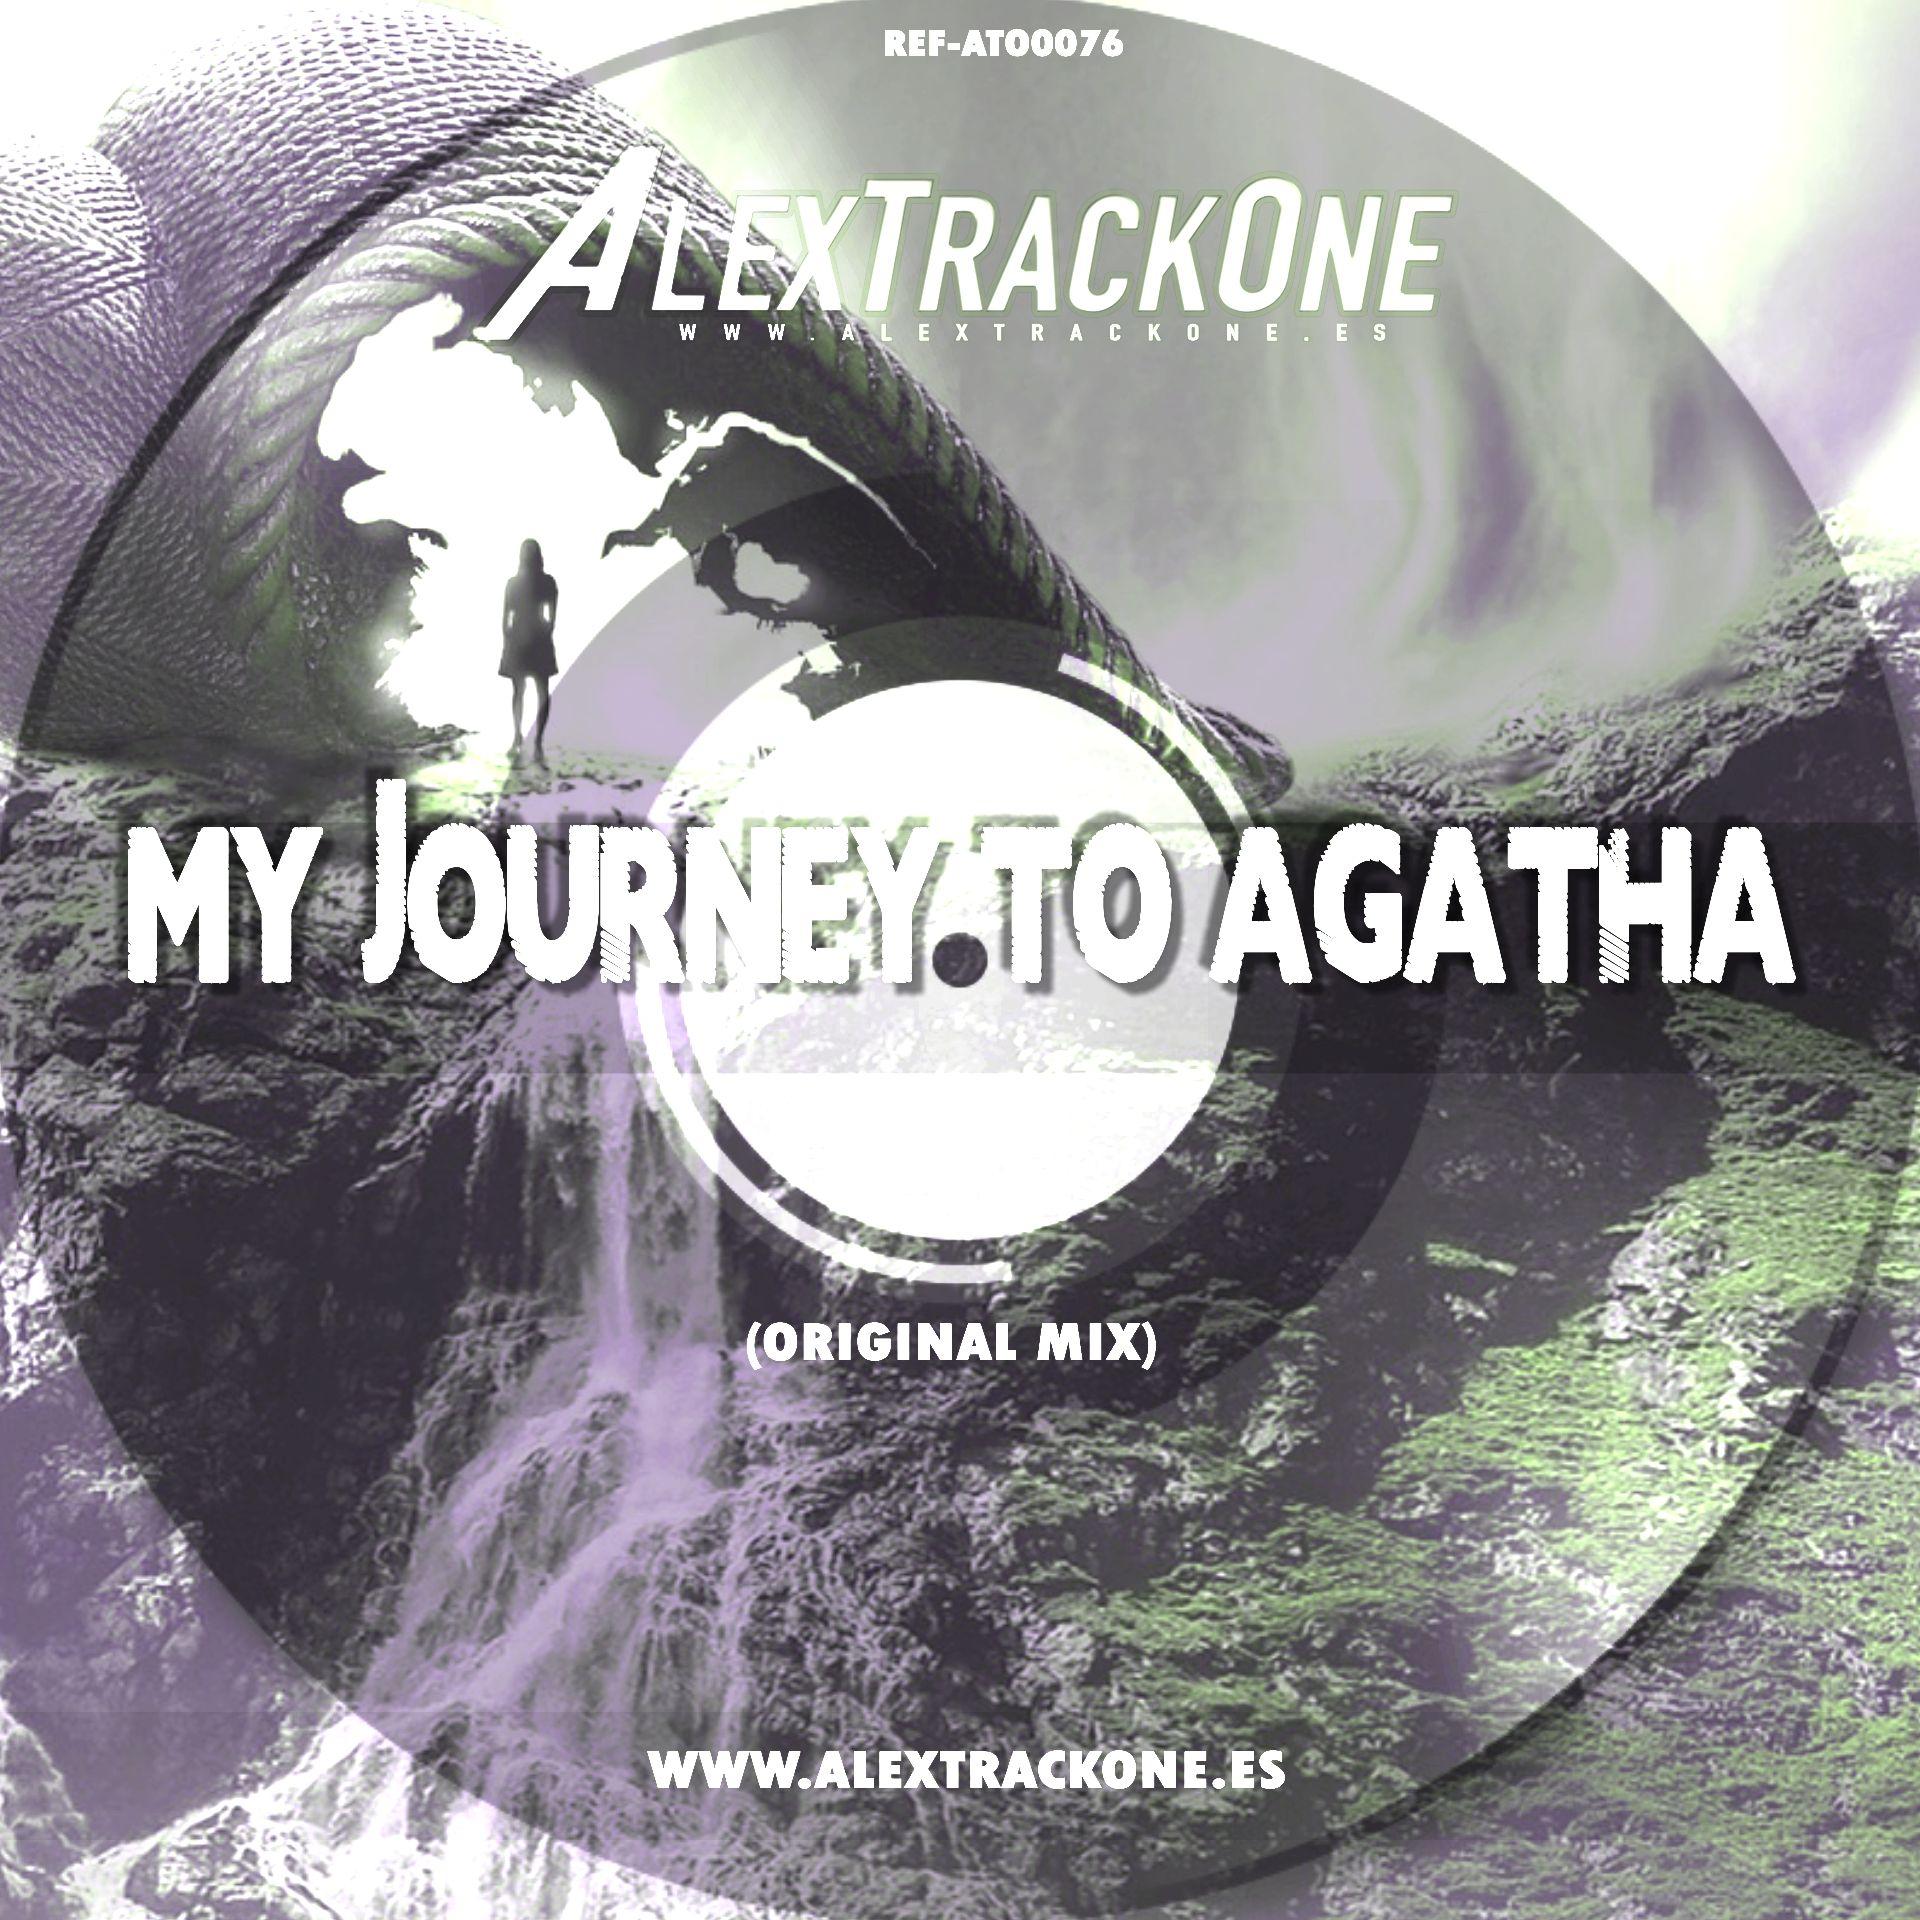 REF-ATO0076 MY JOURNEY TO AGATHA (ORIGINAL MIX) (MP3 & WAV & FLAC)